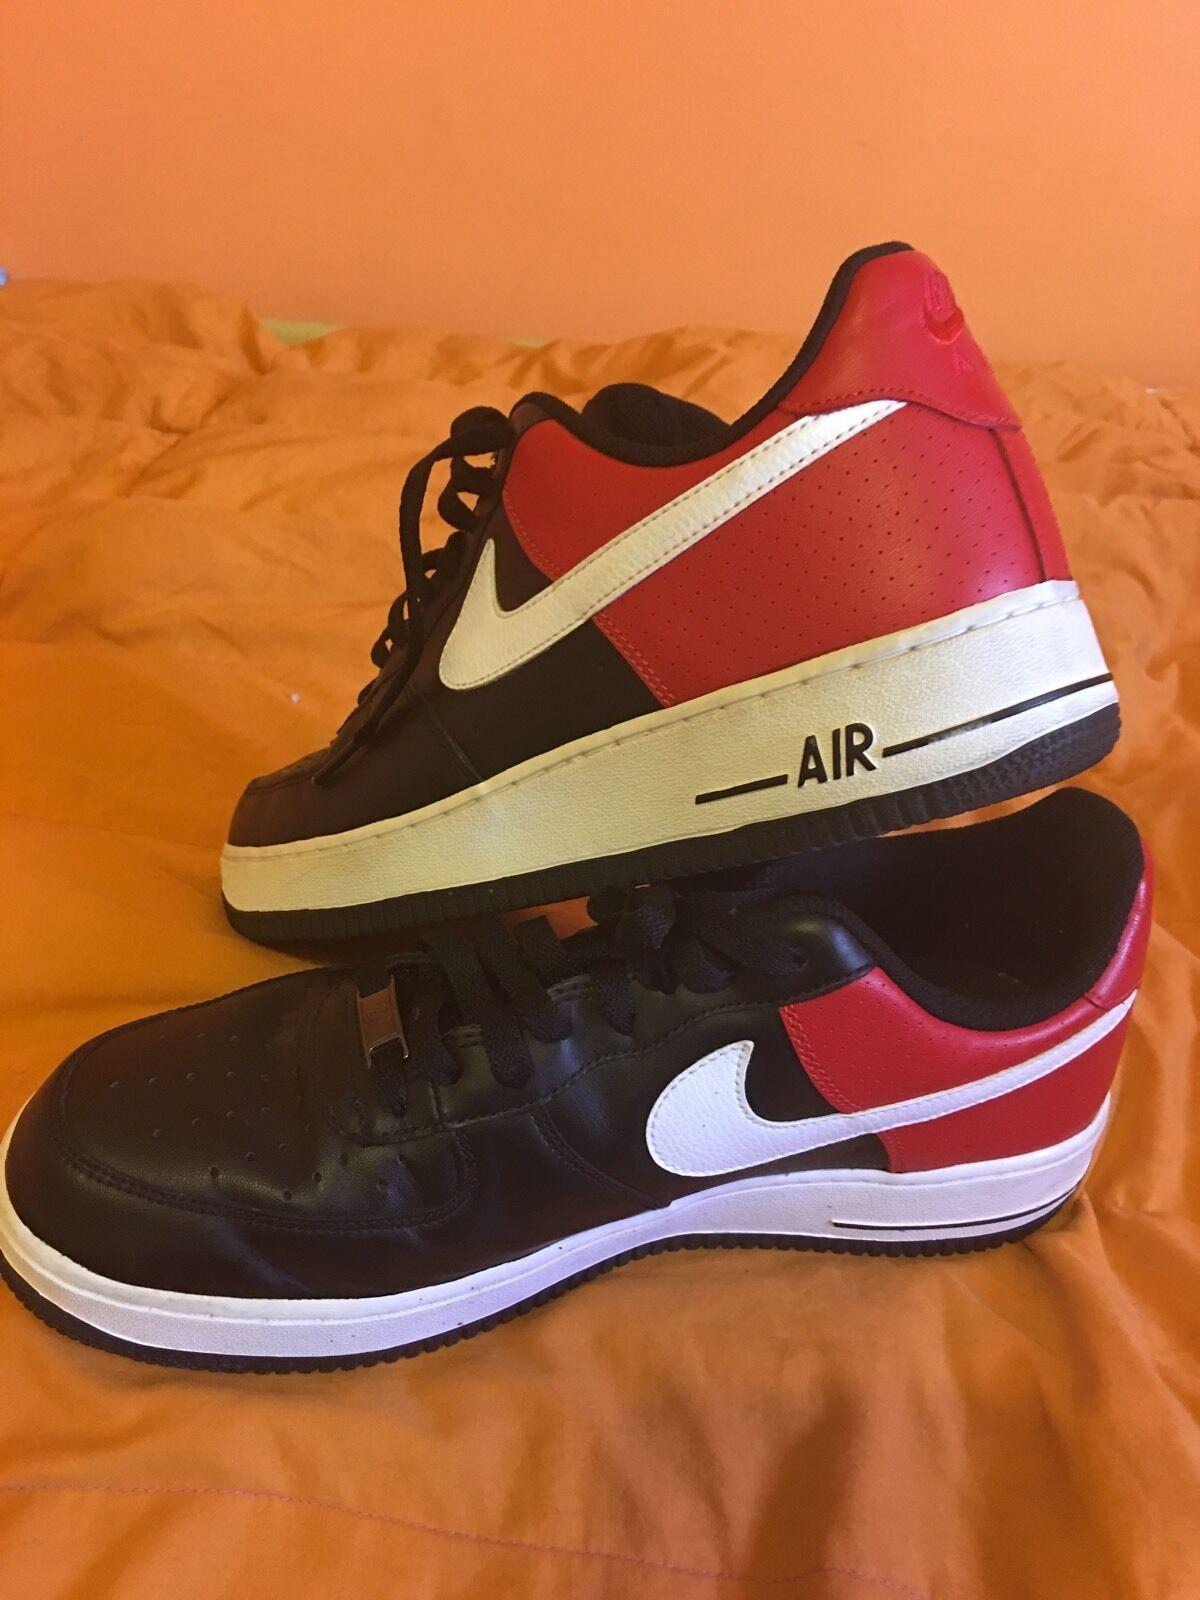 Nike air force 1 uomini 07 scarpa 10,5 12 uomini 1 donne 9682f8